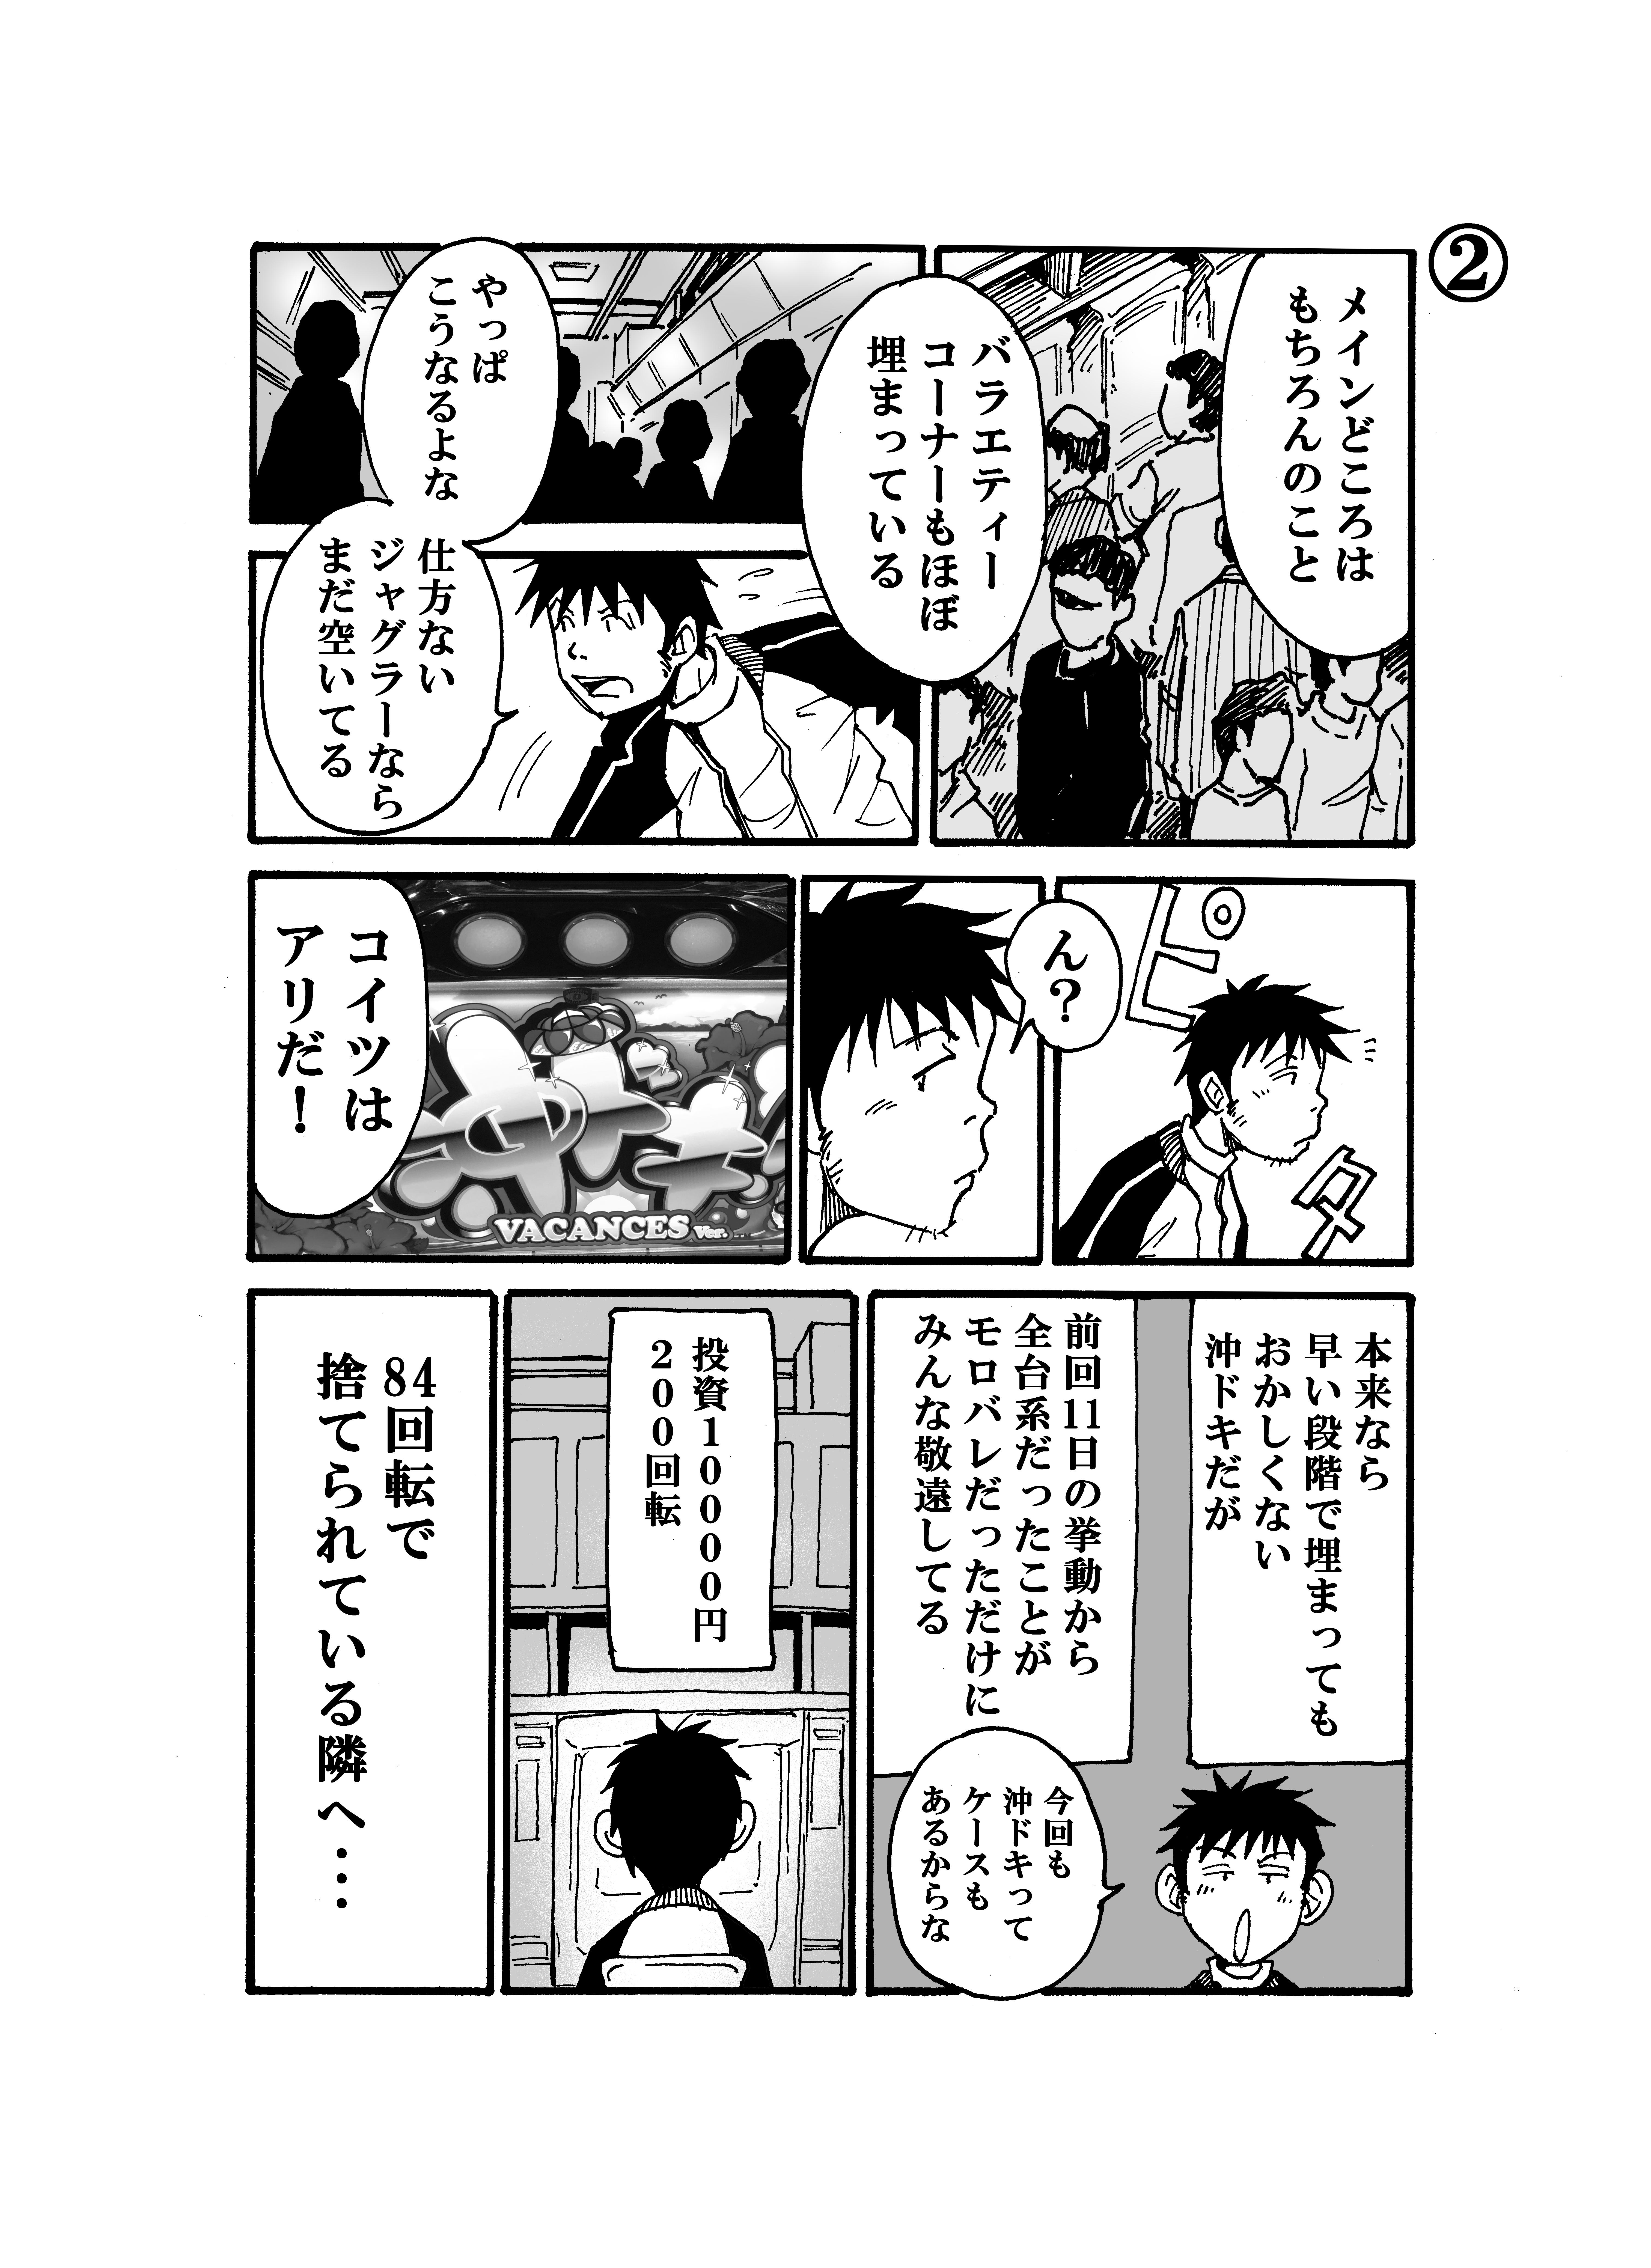 12/21②